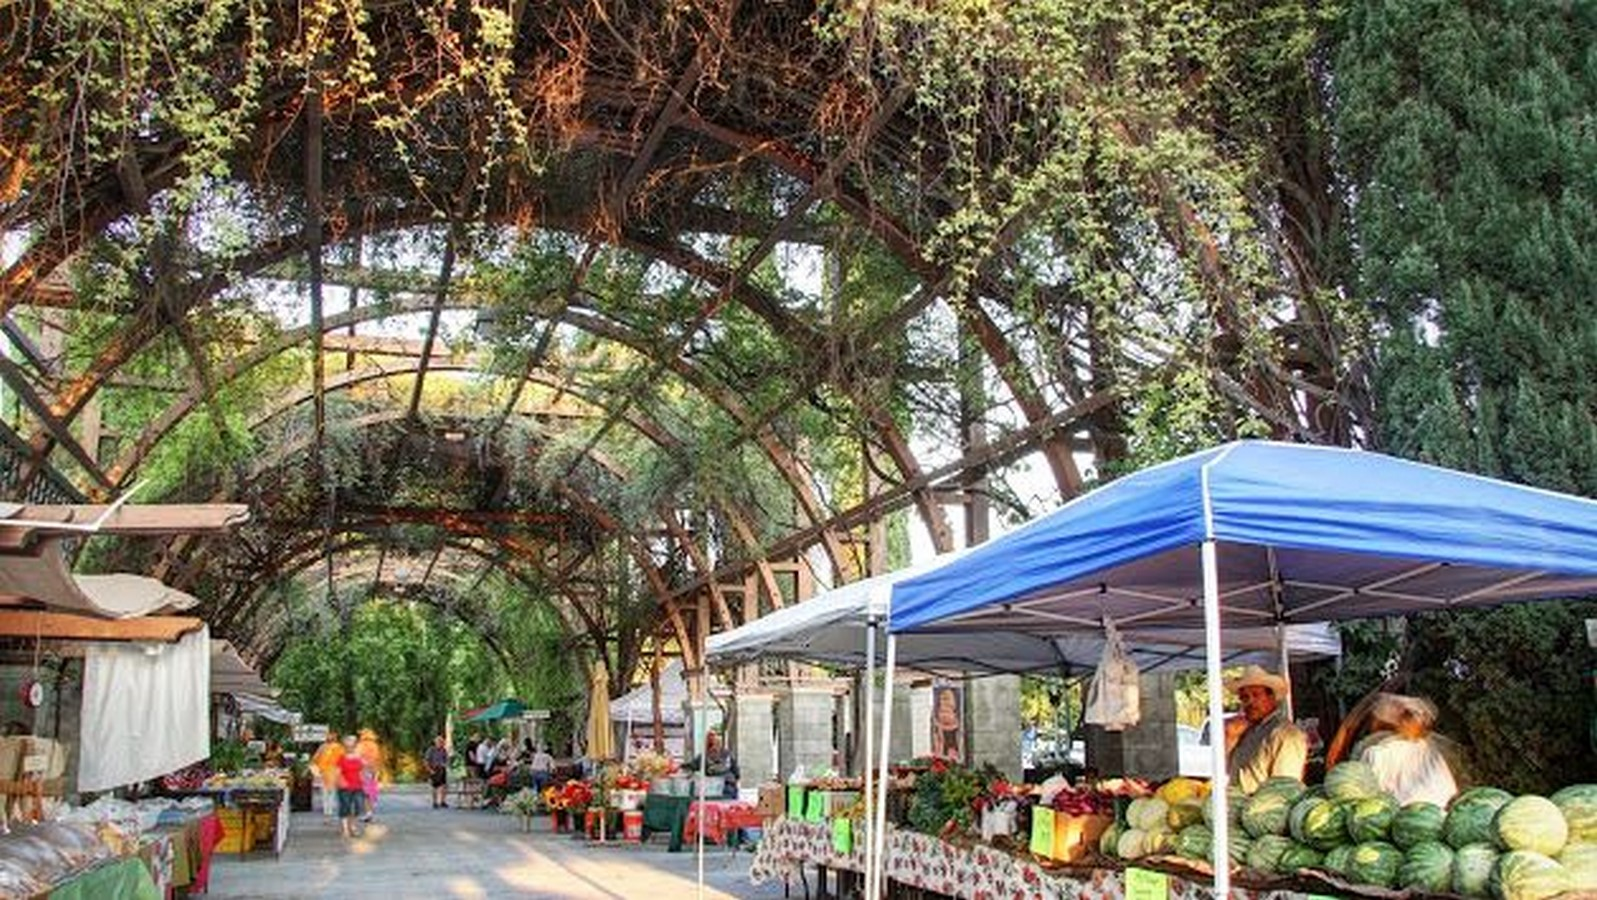 Fresno Farmers Market, Fresno, California. - Sheet1